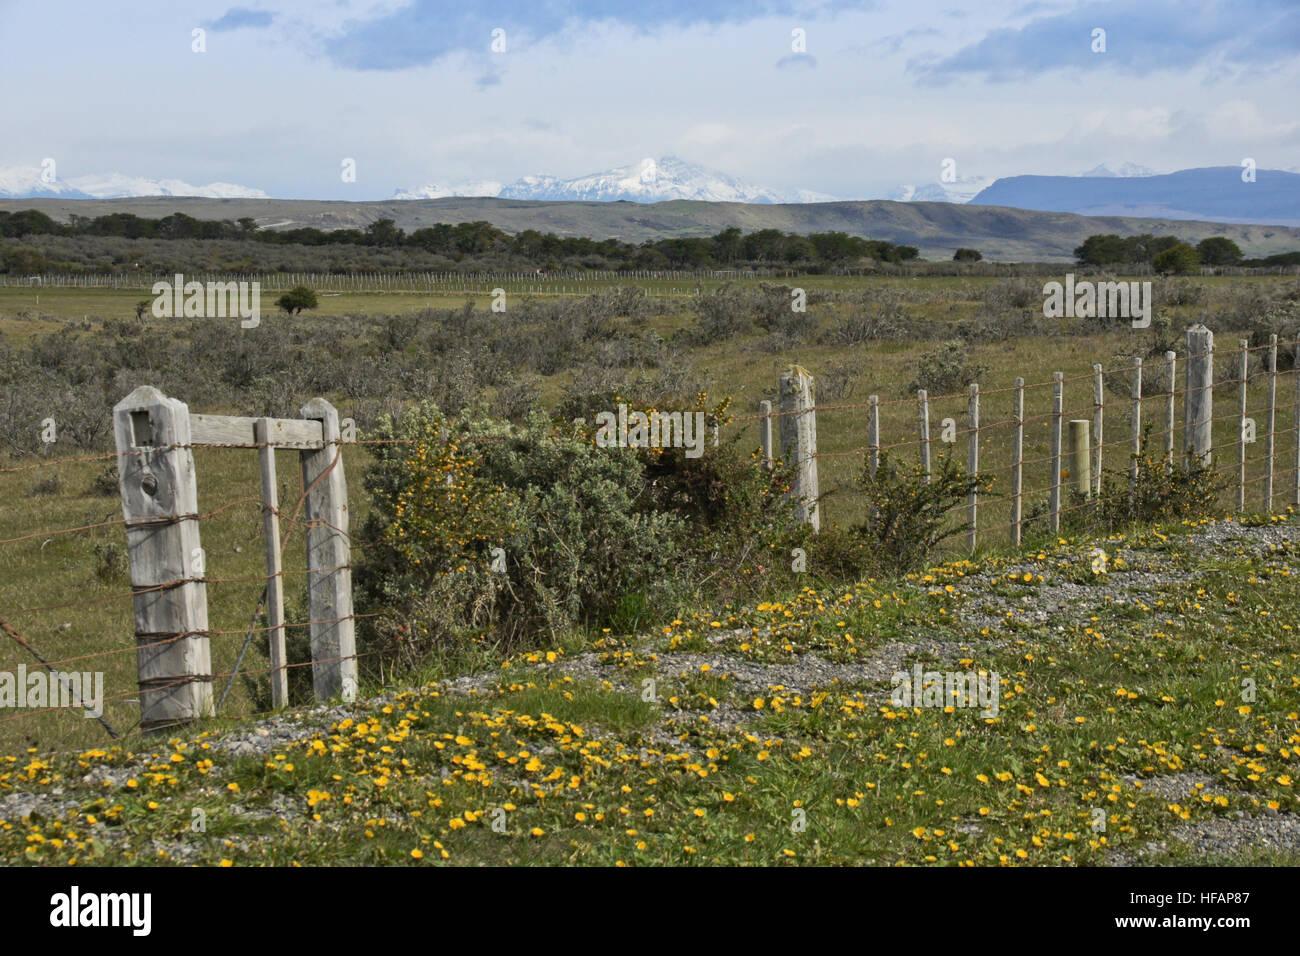 Landscape along Ruta Aonikenk to Rio Verde, north of Punta Arenas, Patagonia, Chile - Stock Image